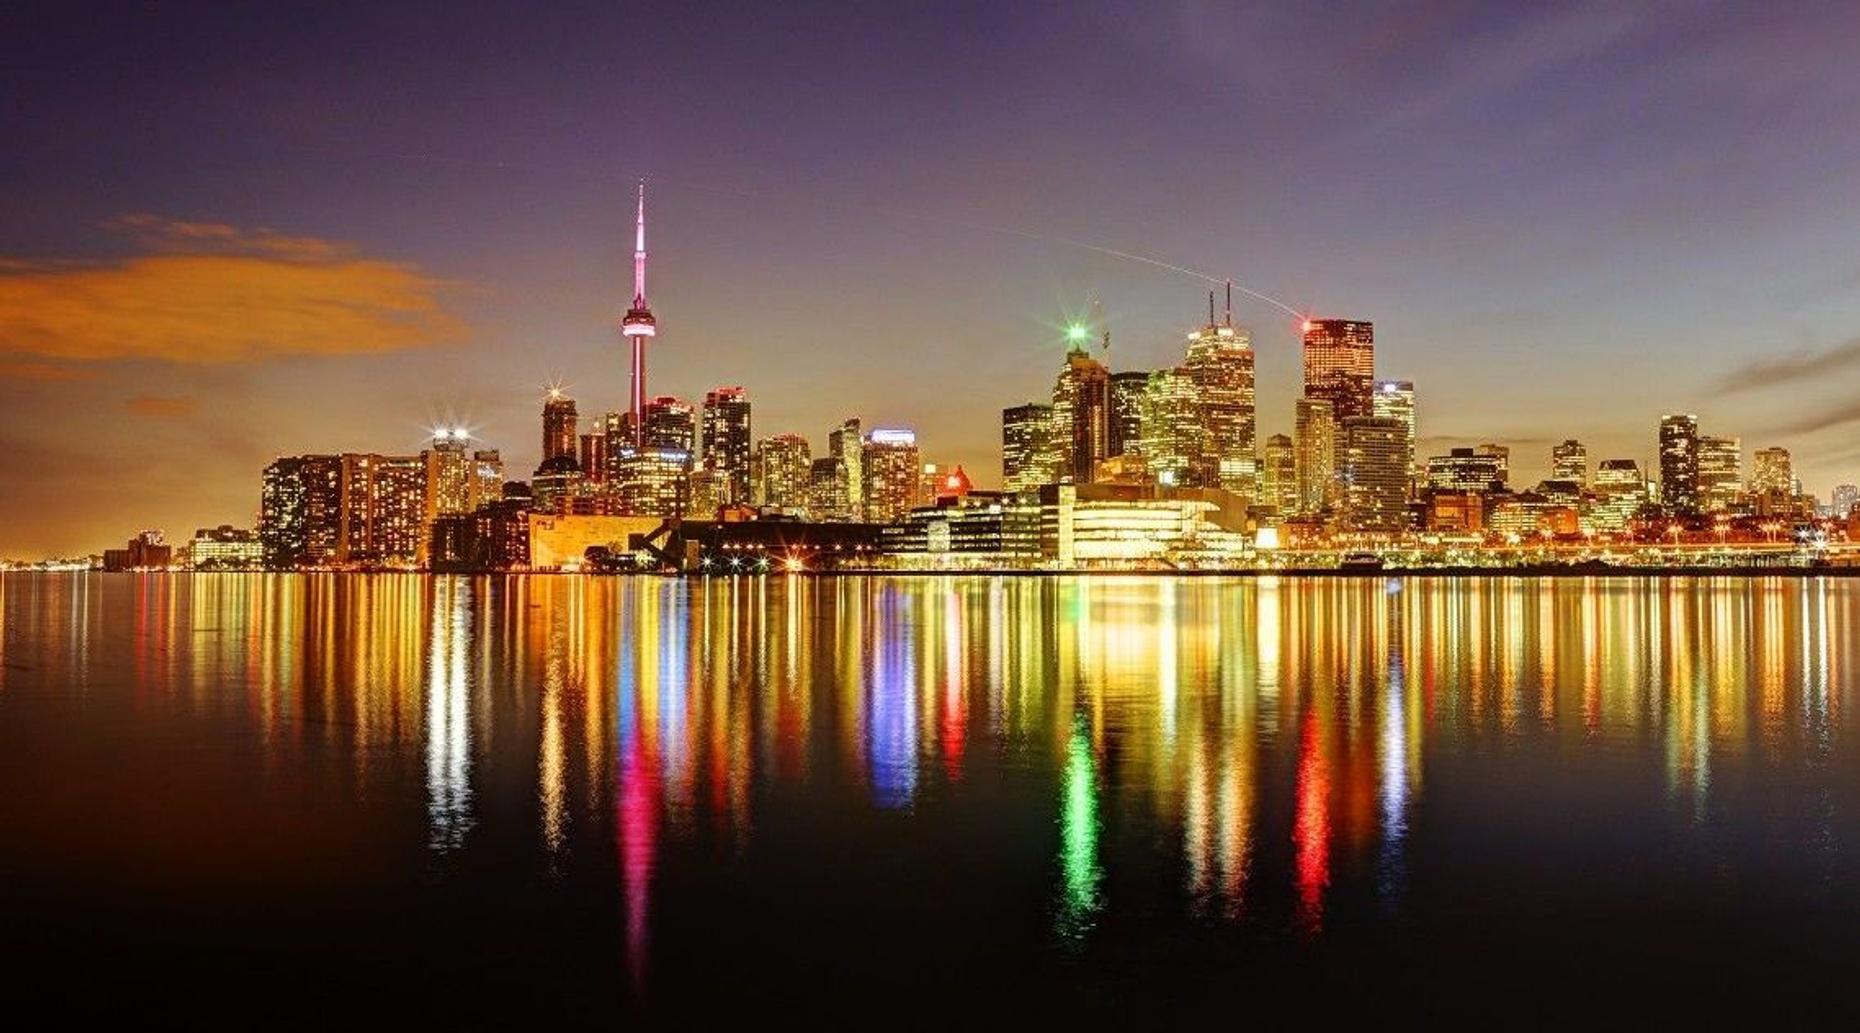 Sunset Plane Tour from Toronto